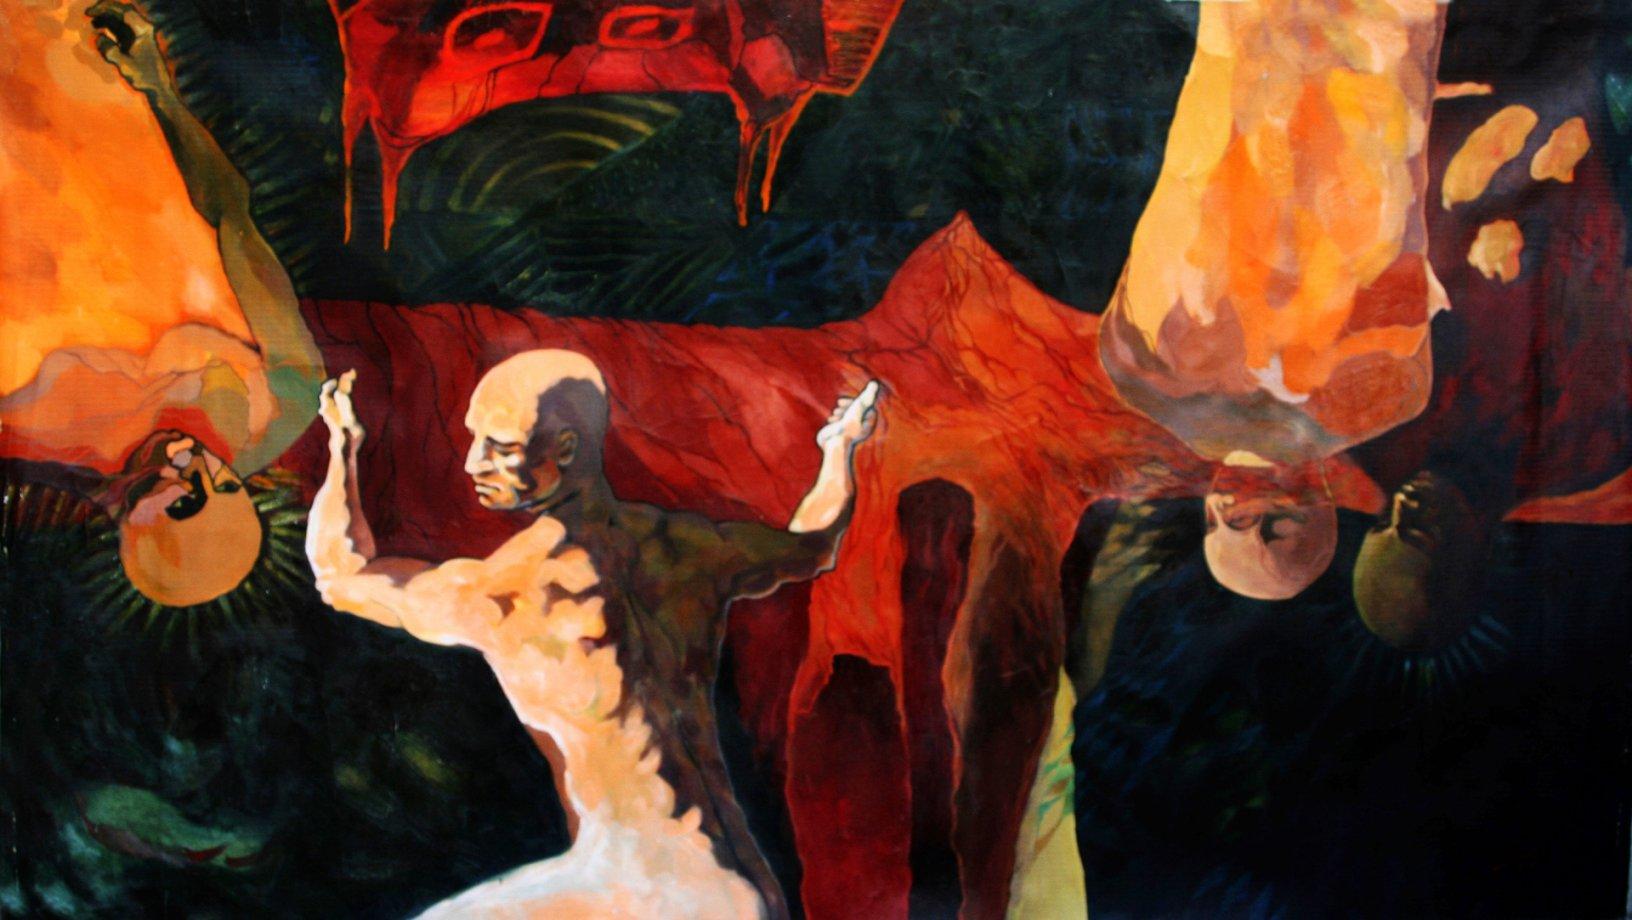 DE LA SERIE ASOMBRO DE MIS SOMBRAS (2005) - Frank Govin